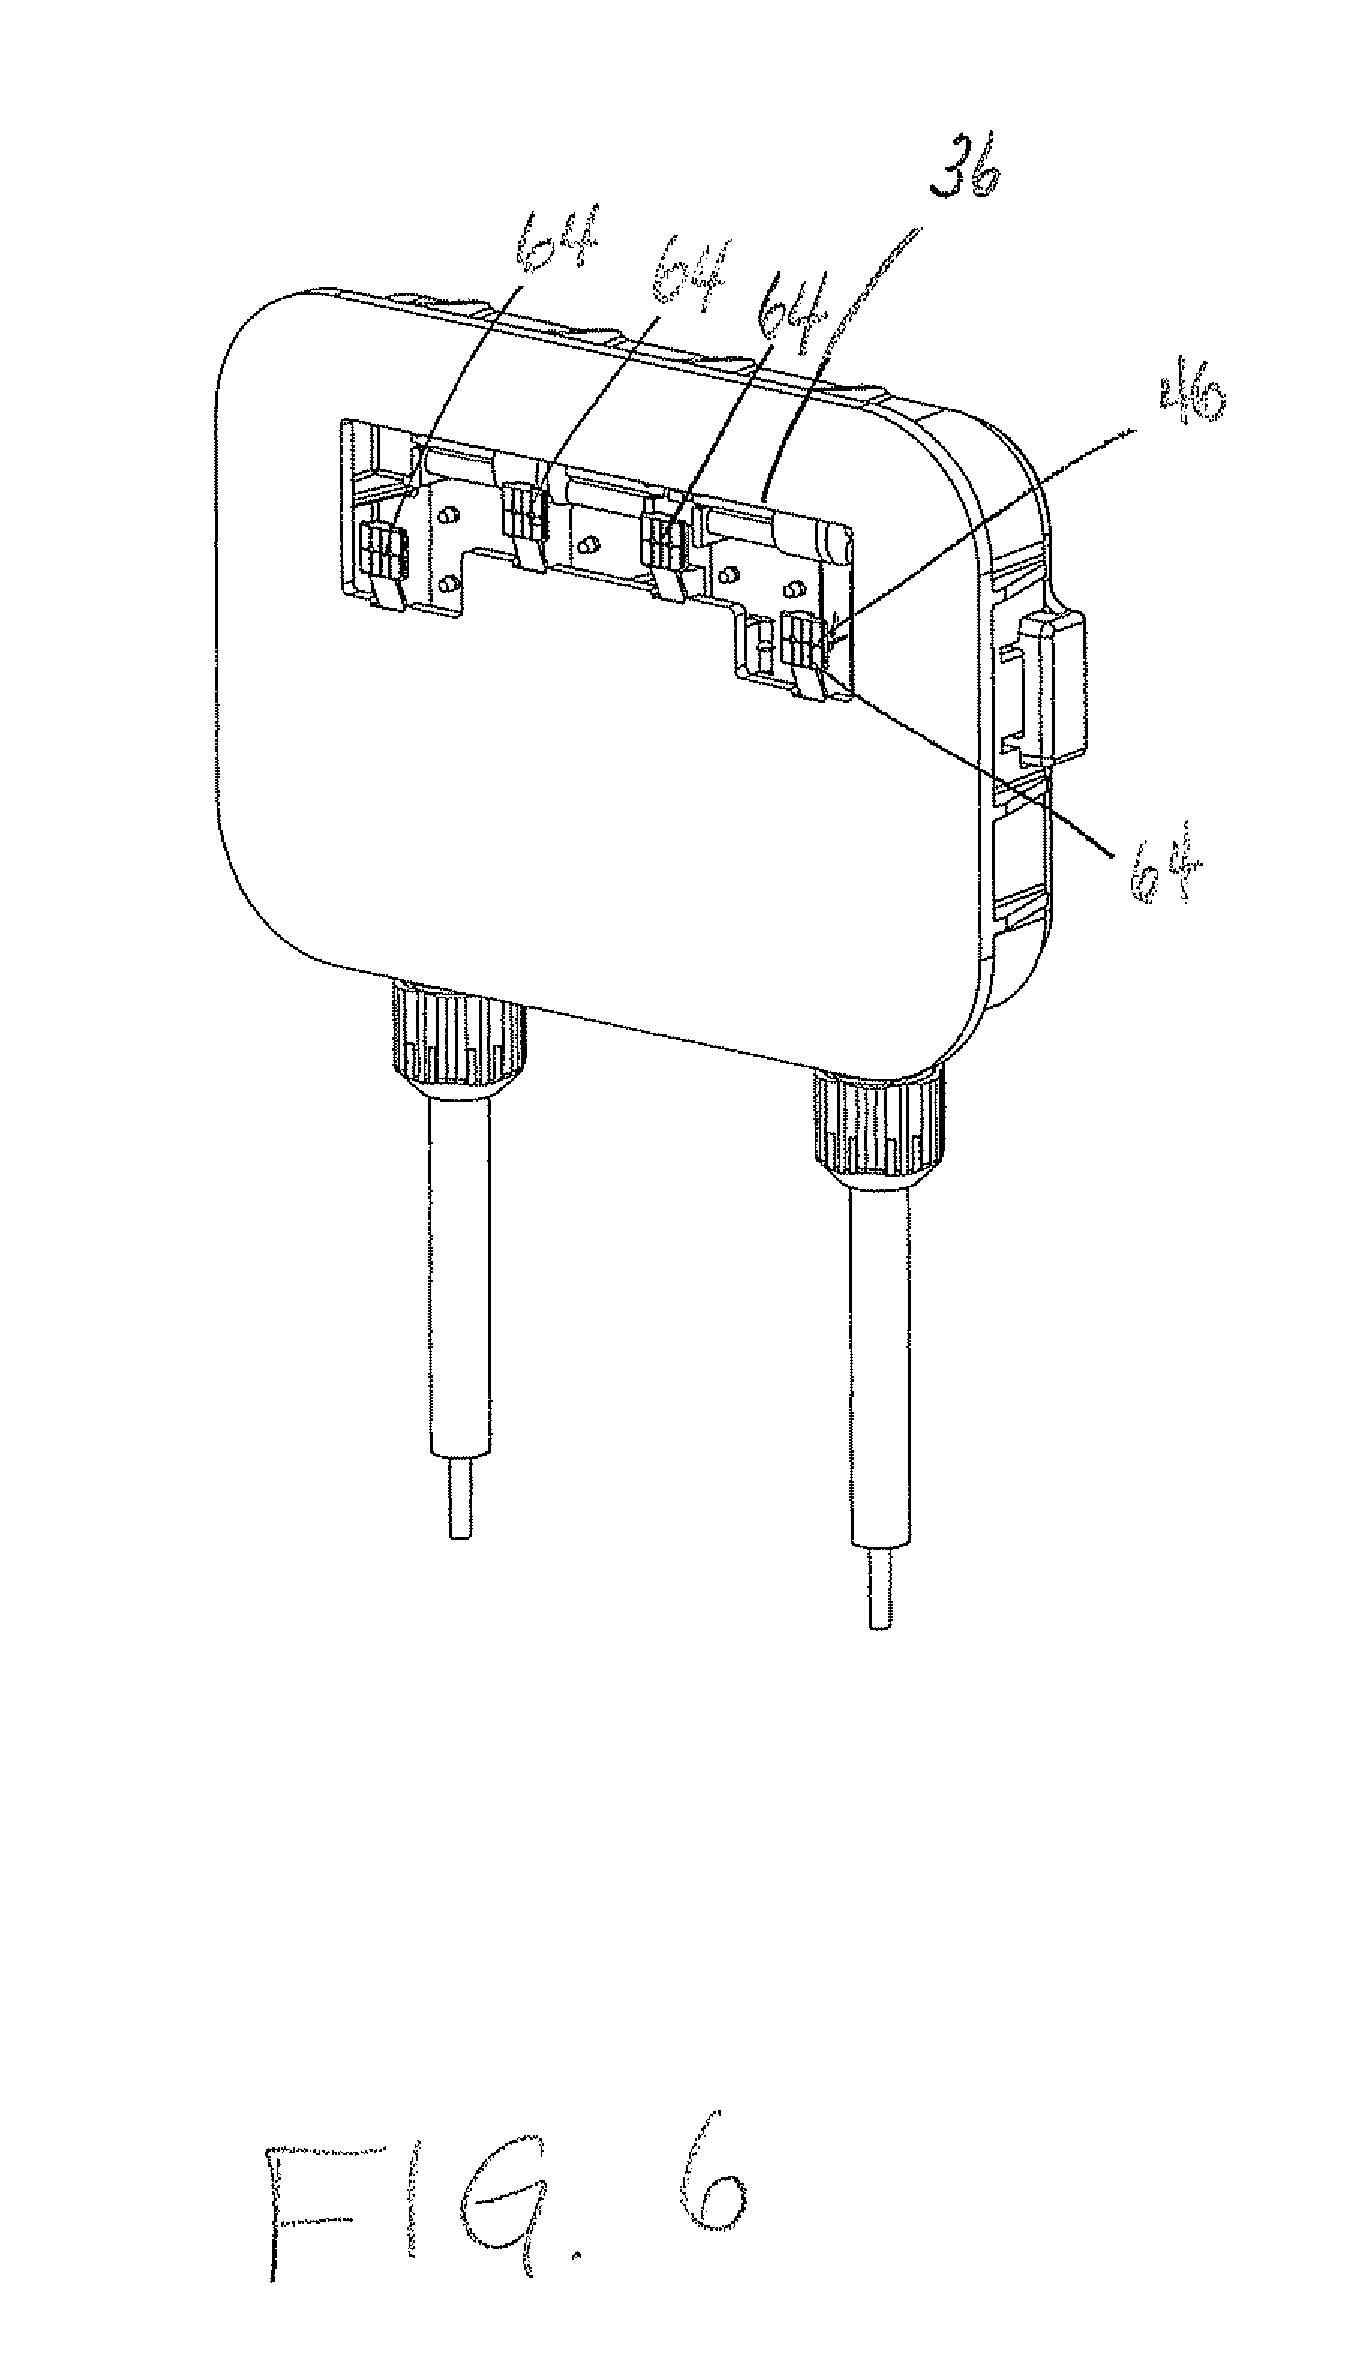 patent us8512050 - solar panel junction box